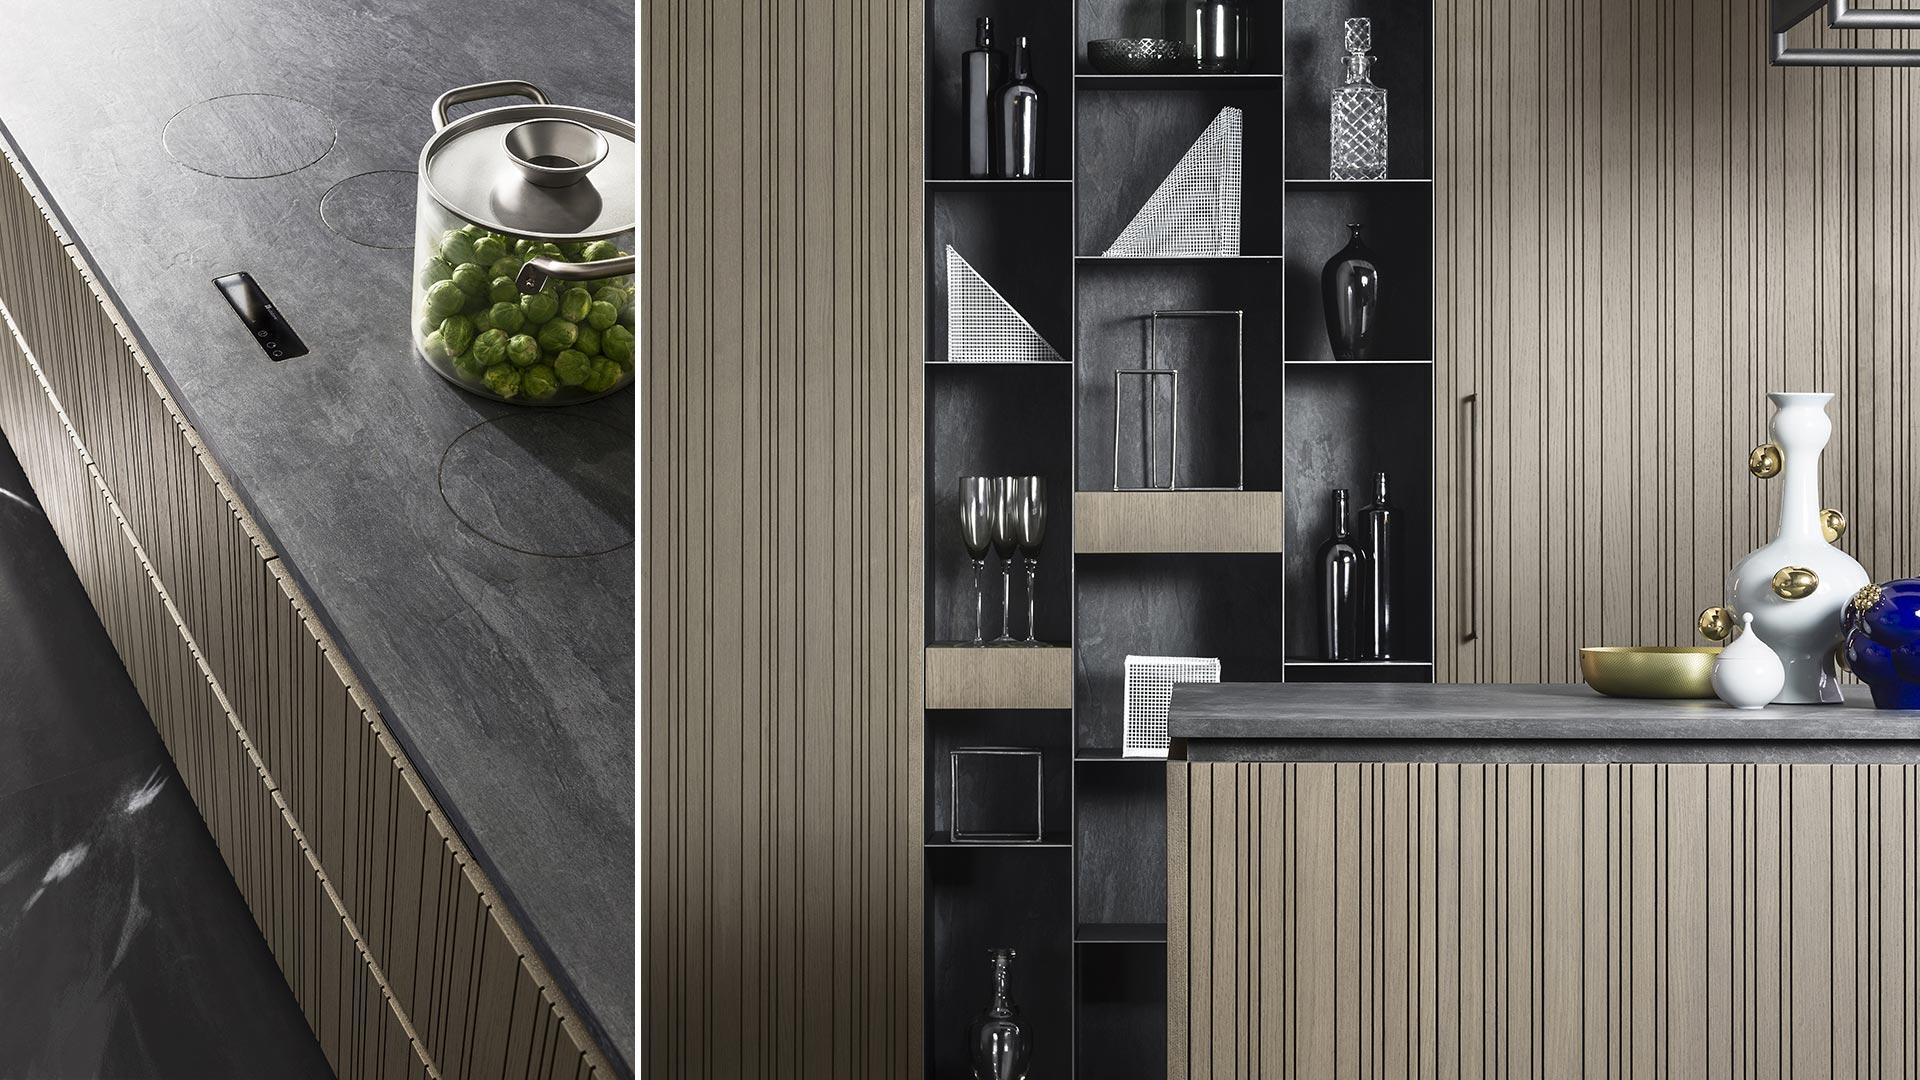 Design kitchen, wood kitchen - Collection RUA - TM_MI2018_Rua_002